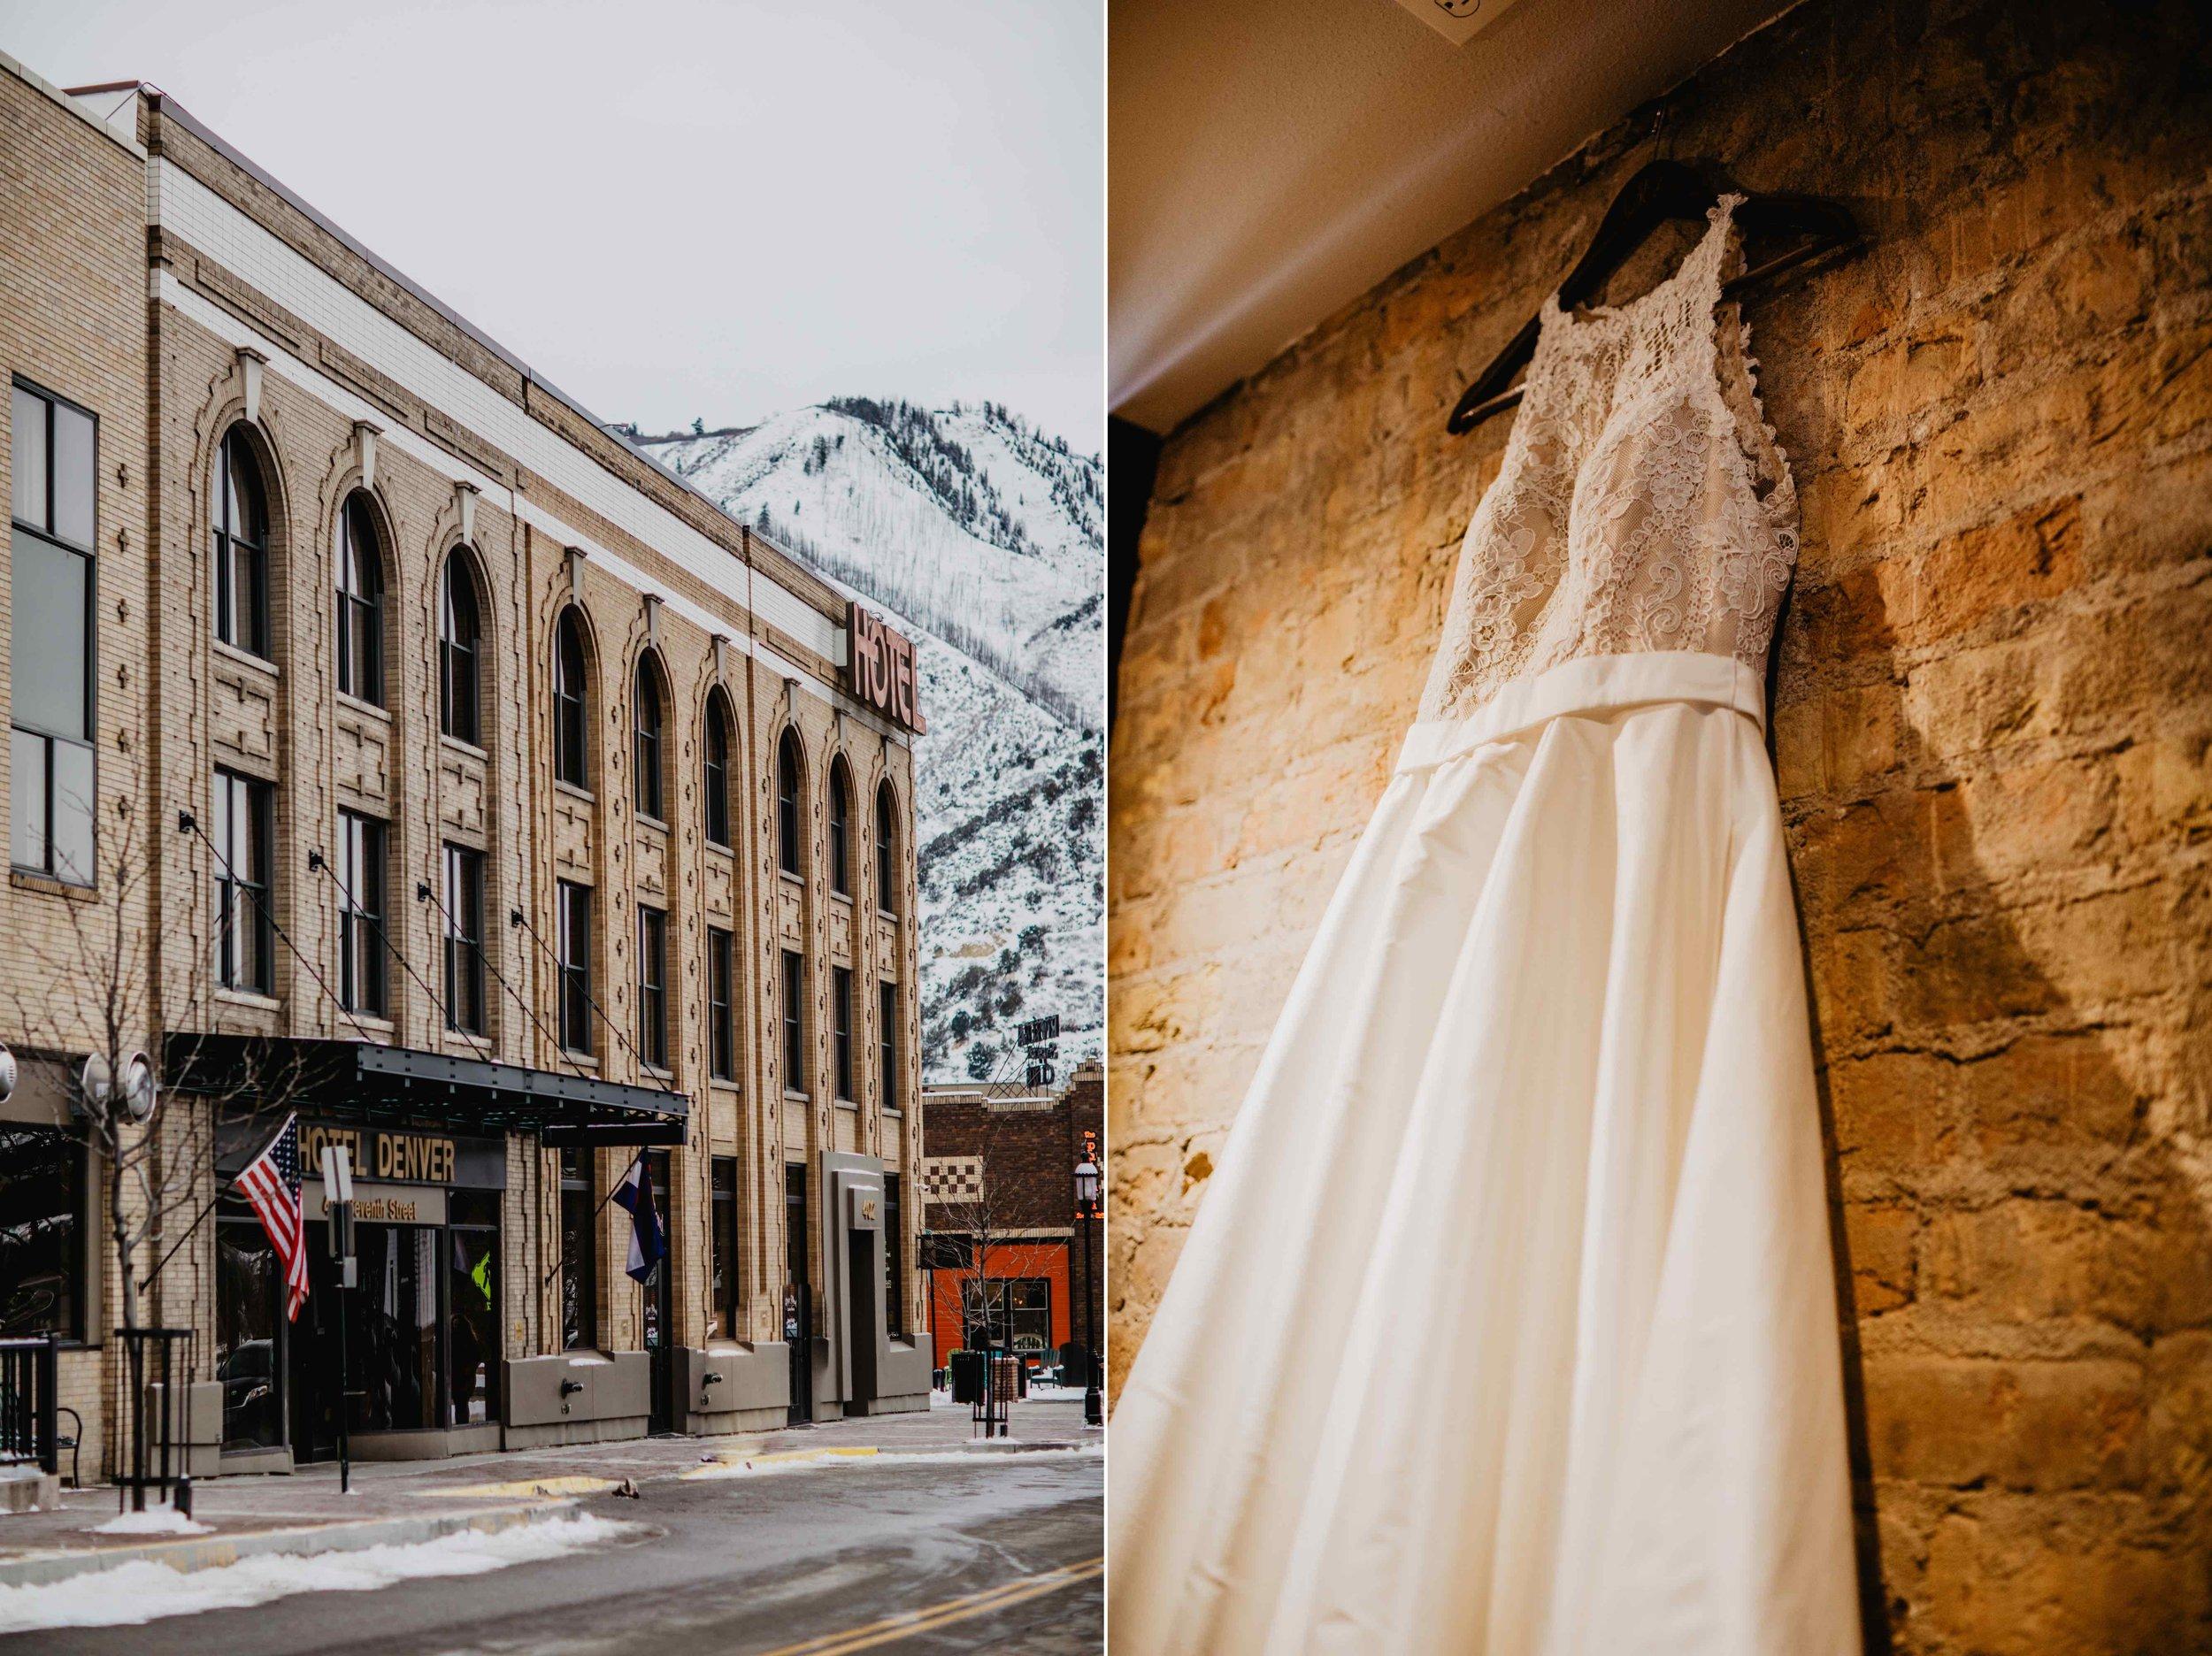 Kisa Conrad Favorites-0010-colorado-wedding-photographer-denver-springs-vailhotel-glenwood-springs-colorado-wedding-photographer.jpeg